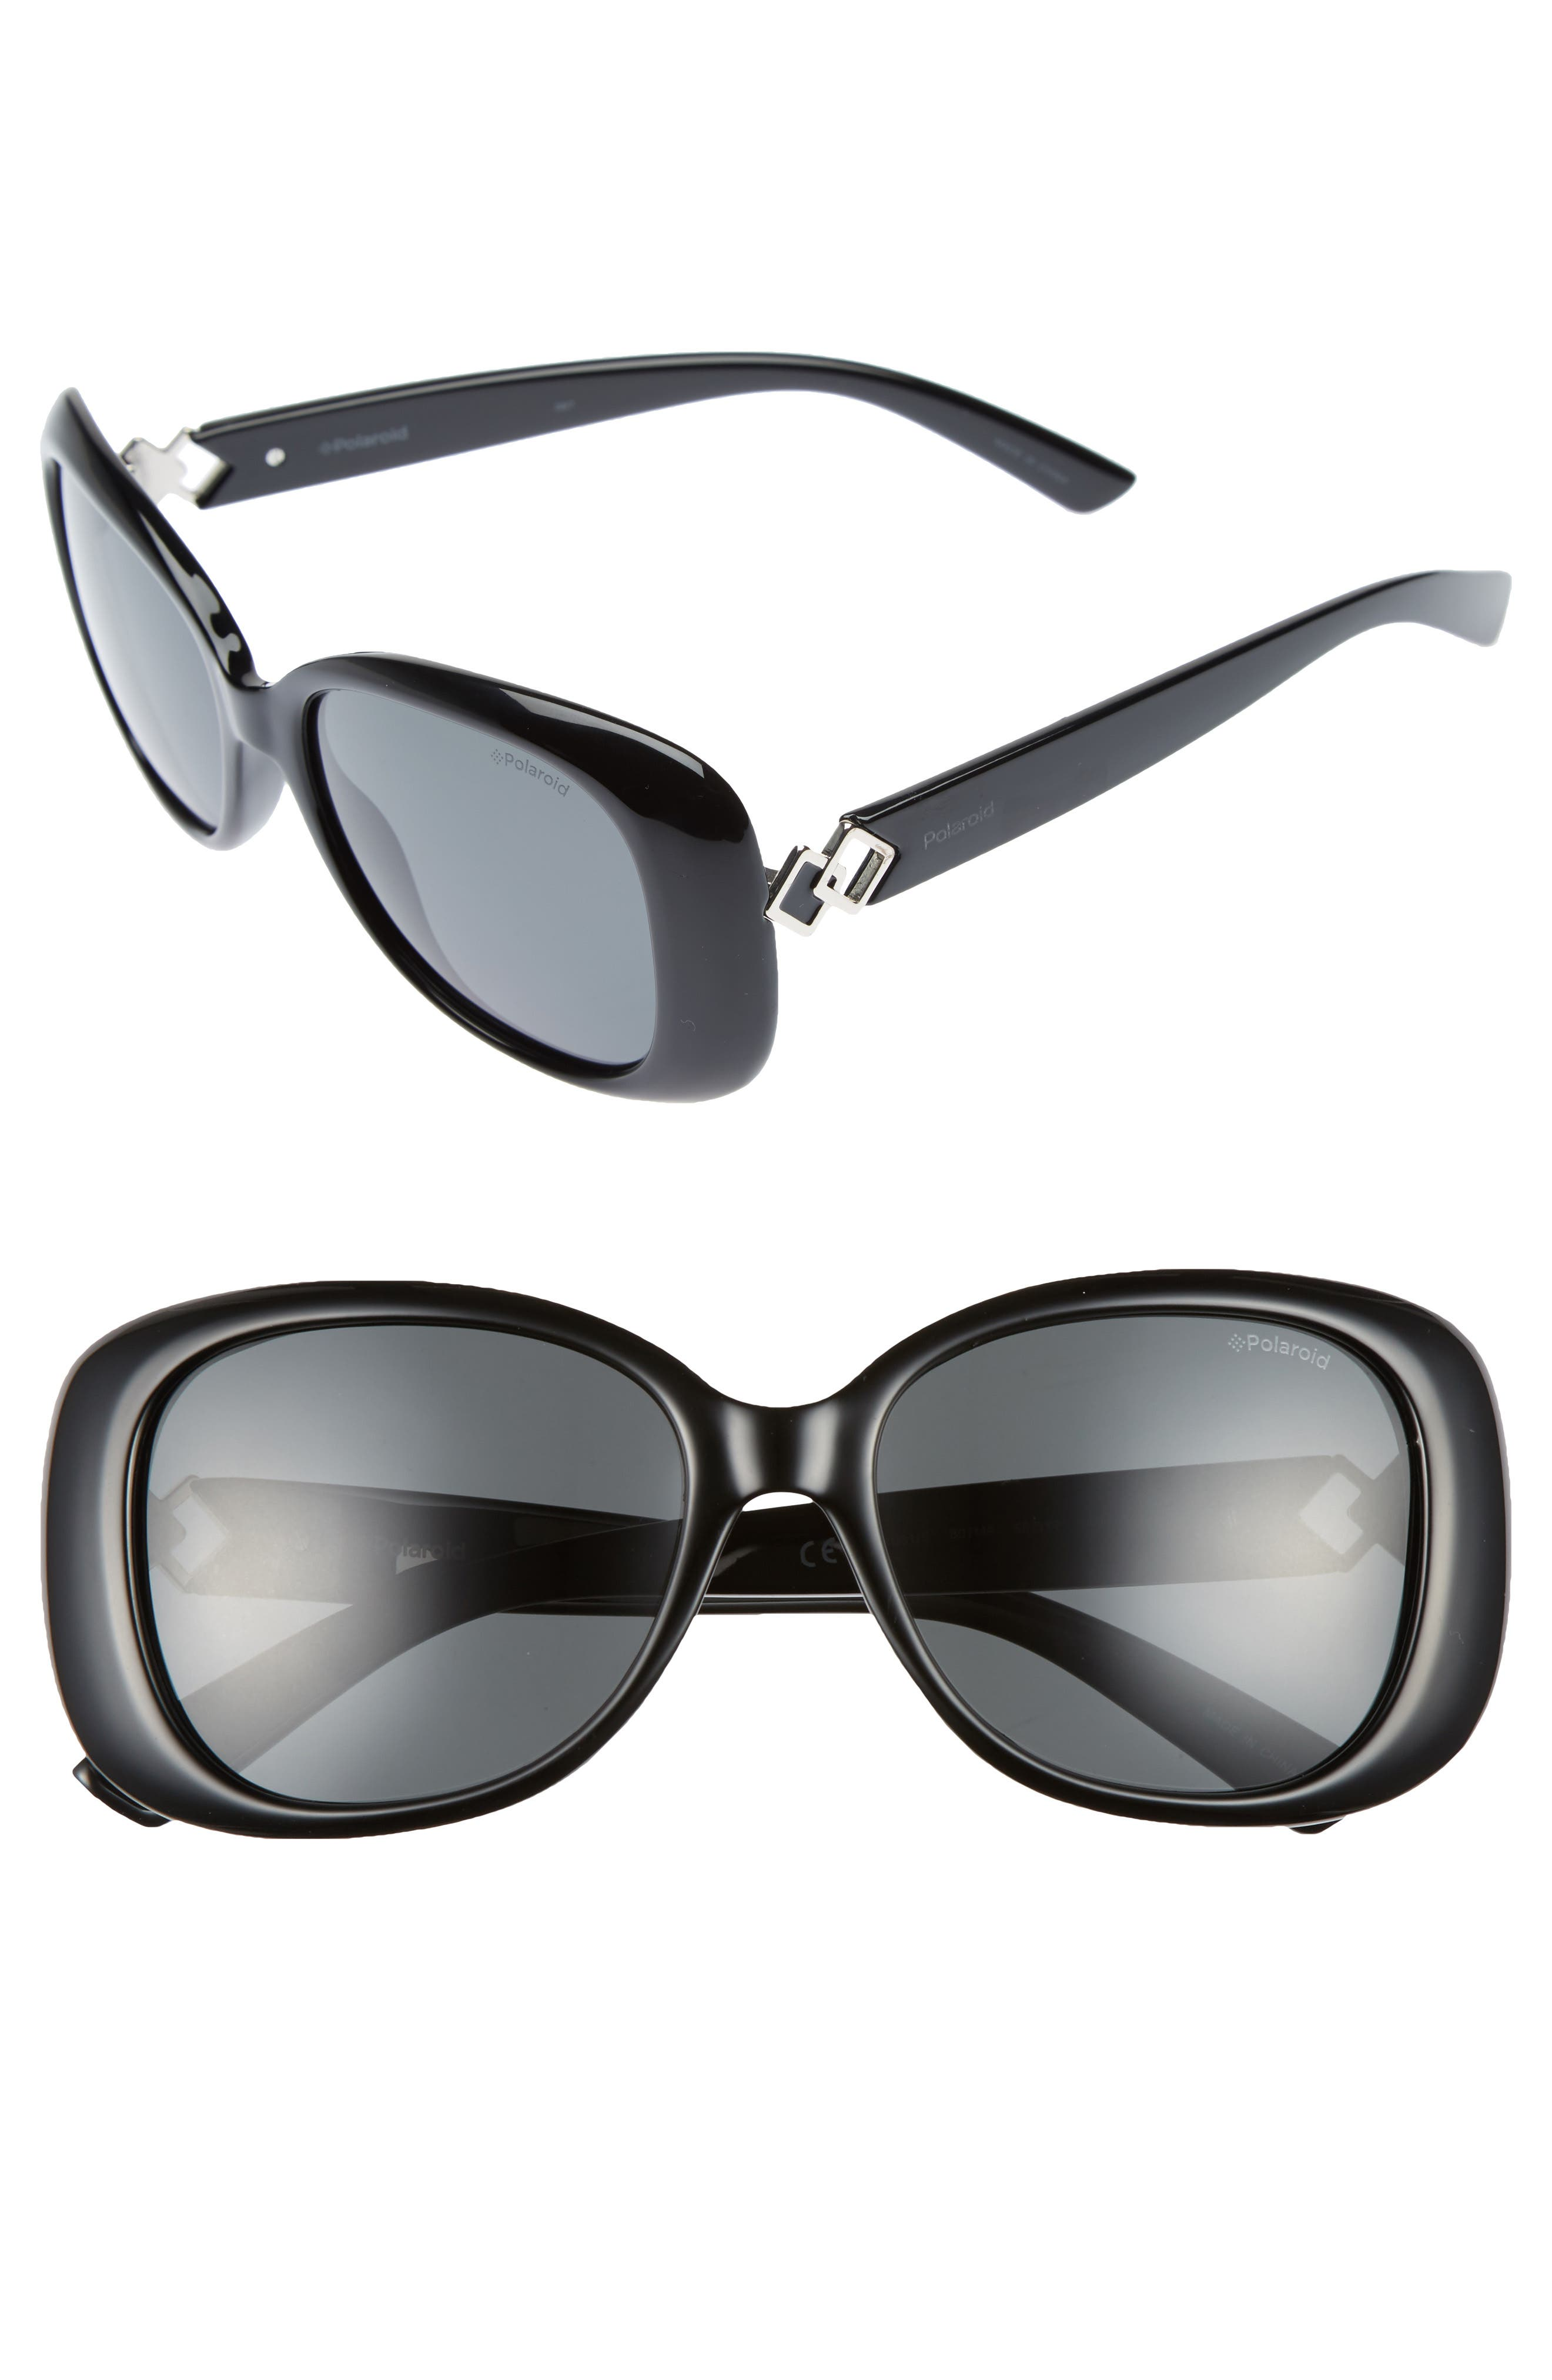 Main Image - Polaroid 55mm Polarized Butterfly Sunglasses